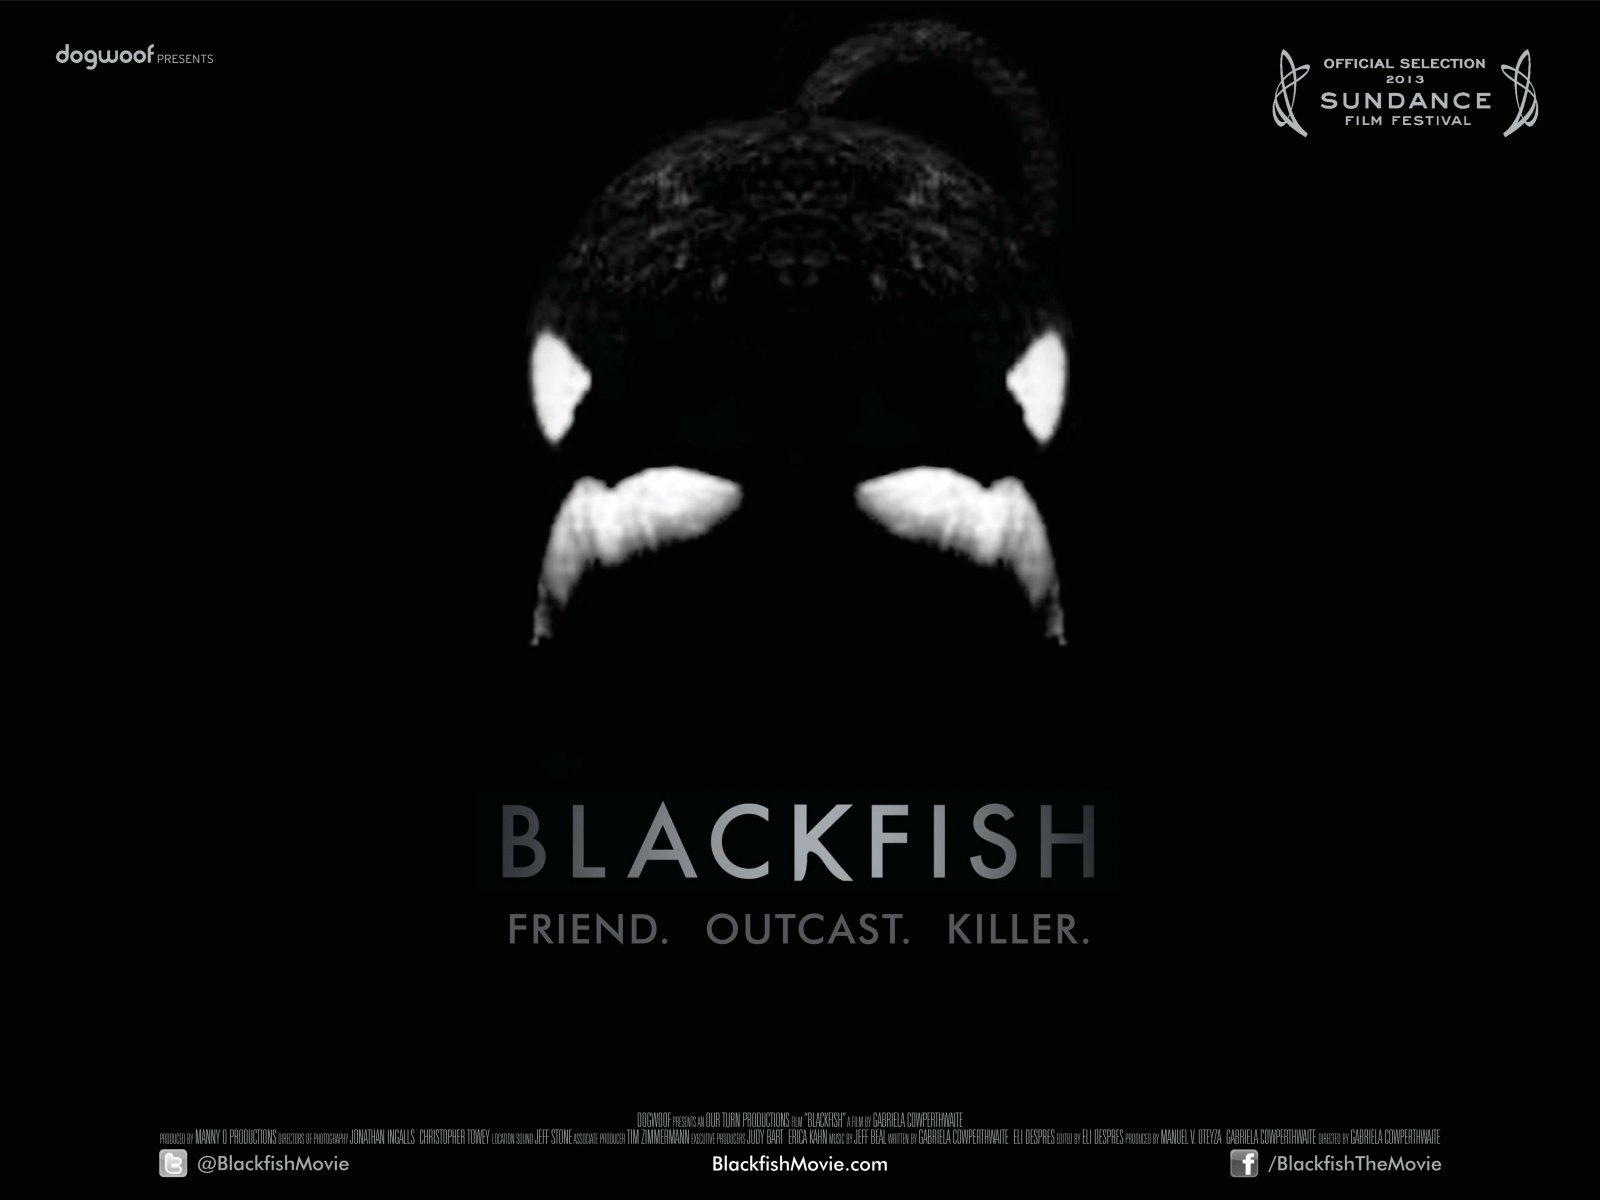 Dogwoof_Documentary_Blackfish_Quad_New_1600_1200_85